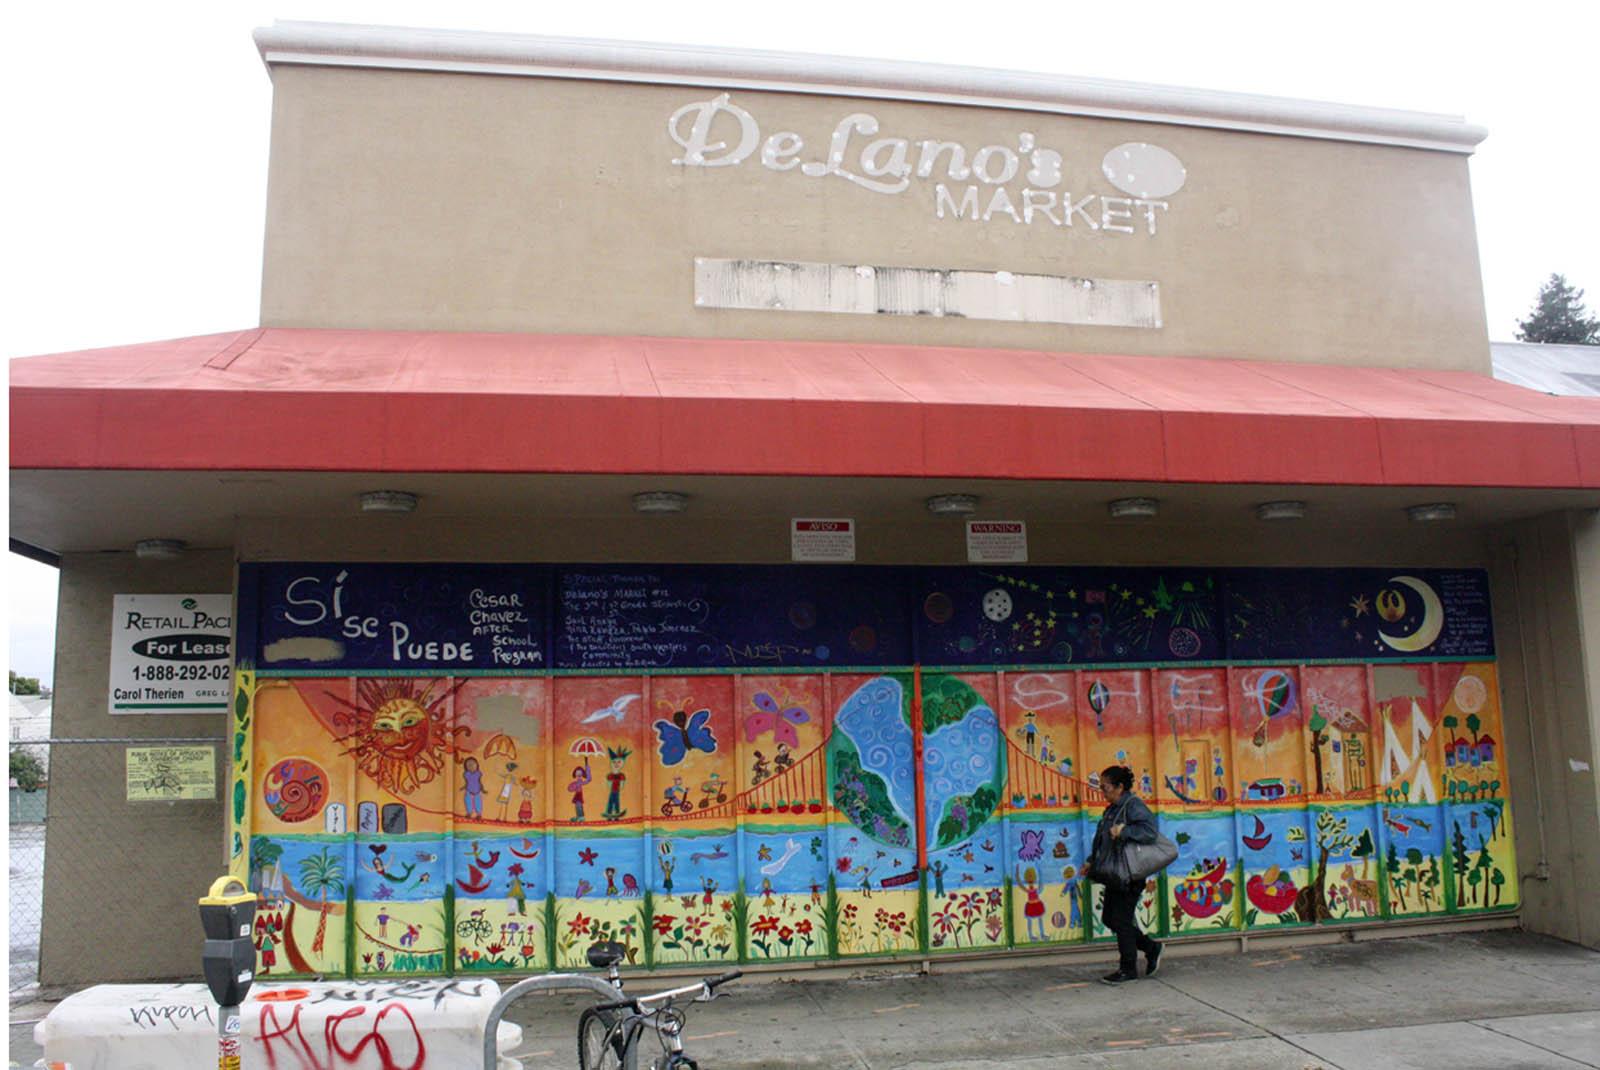 Fresh & Easy will move in the former DeLano's supermarket location